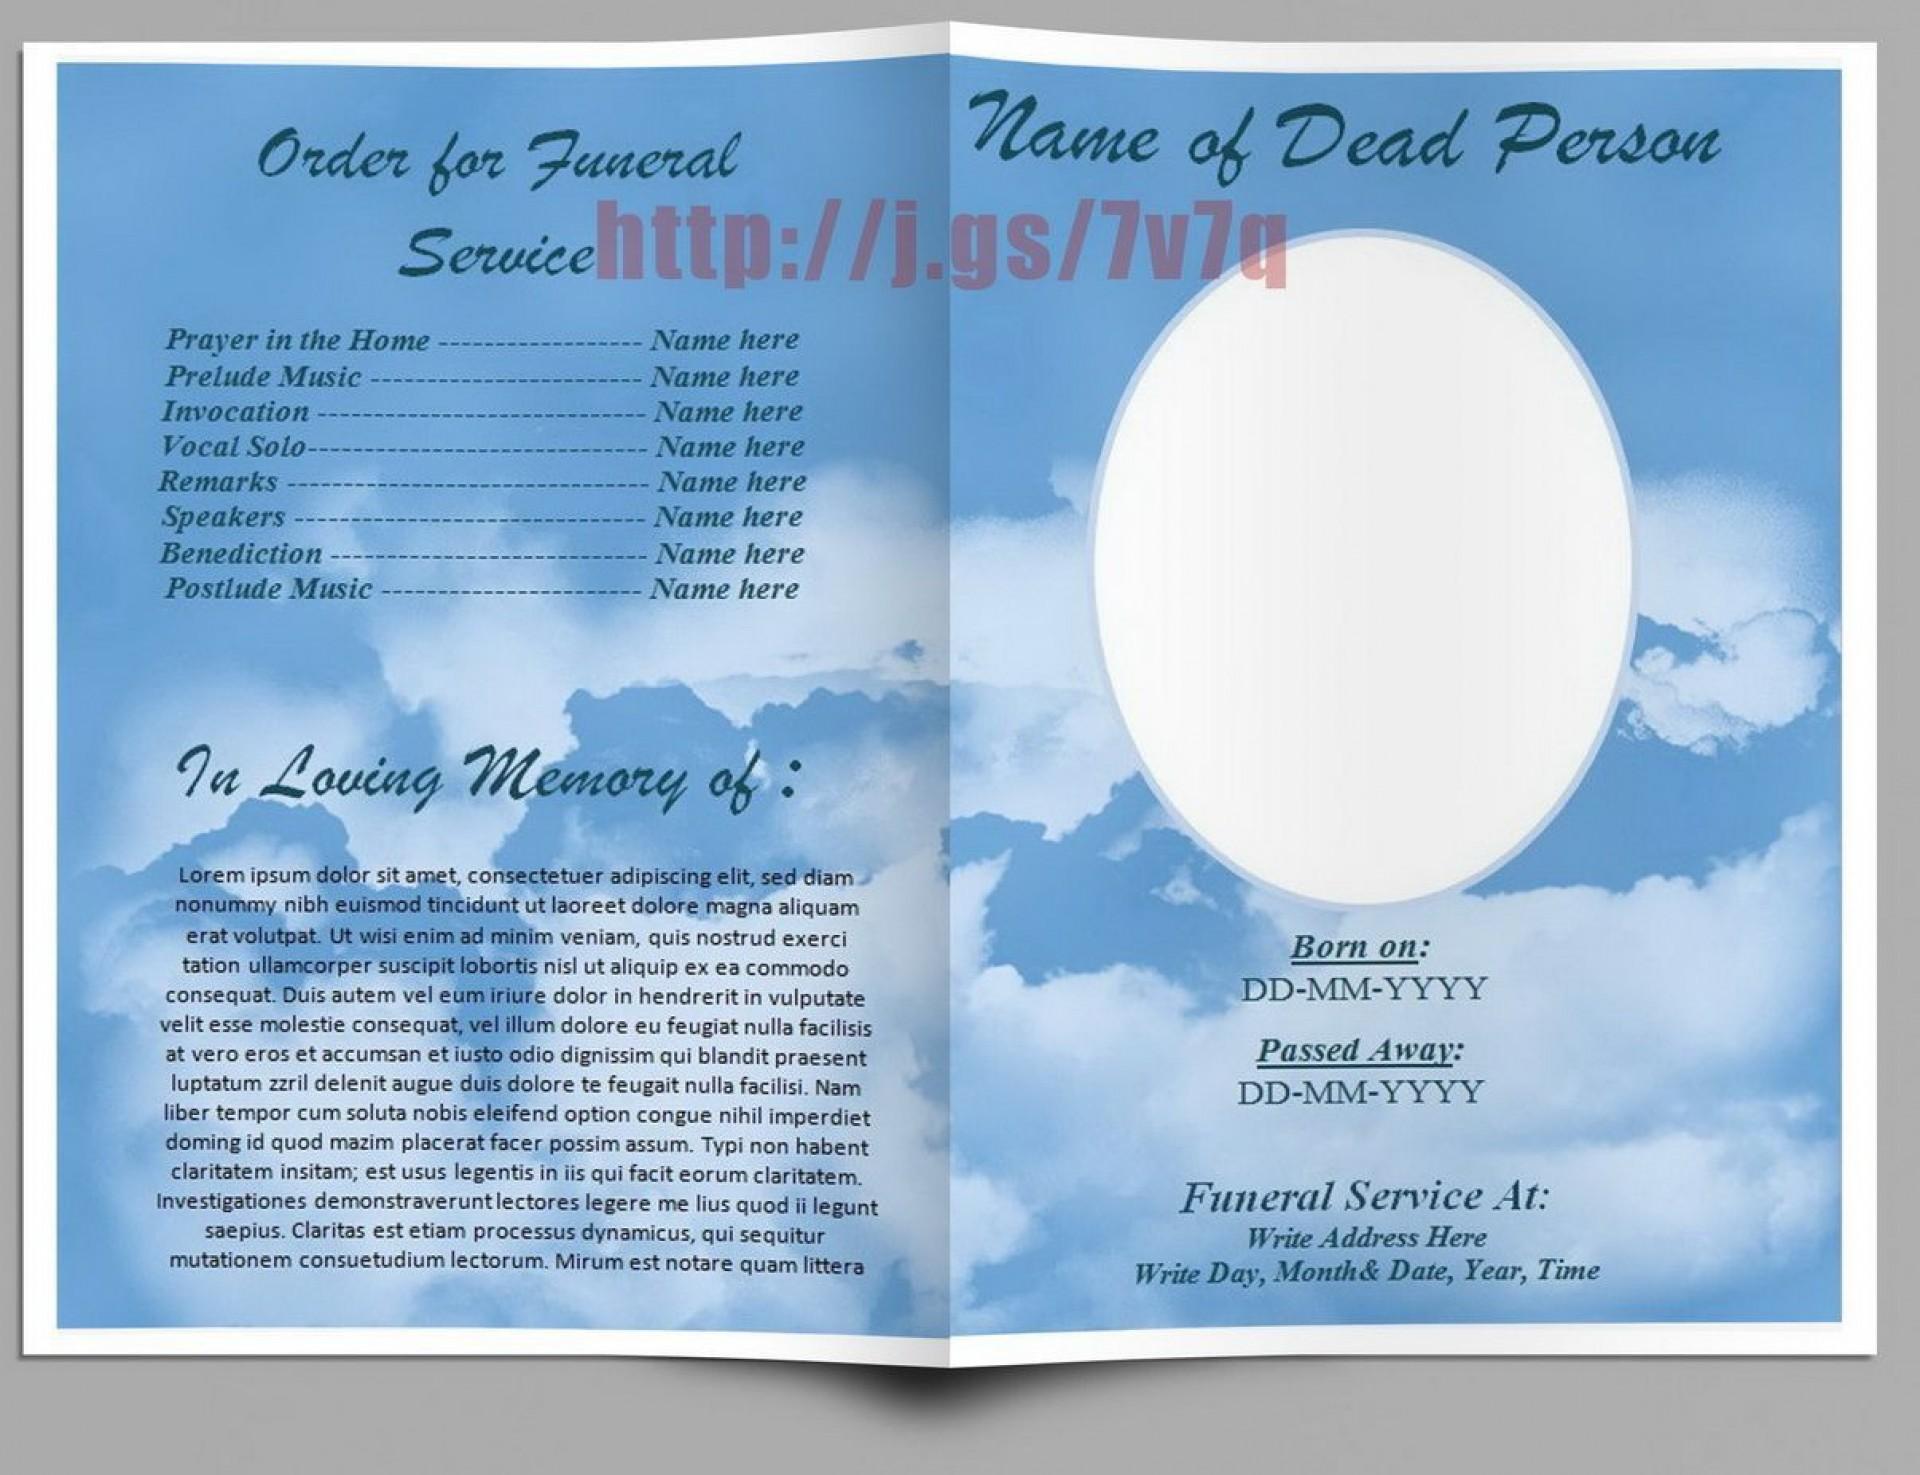 003 Frightening Free Funeral Program Template Word Image  Microsoft 2010 Tri Fold1920